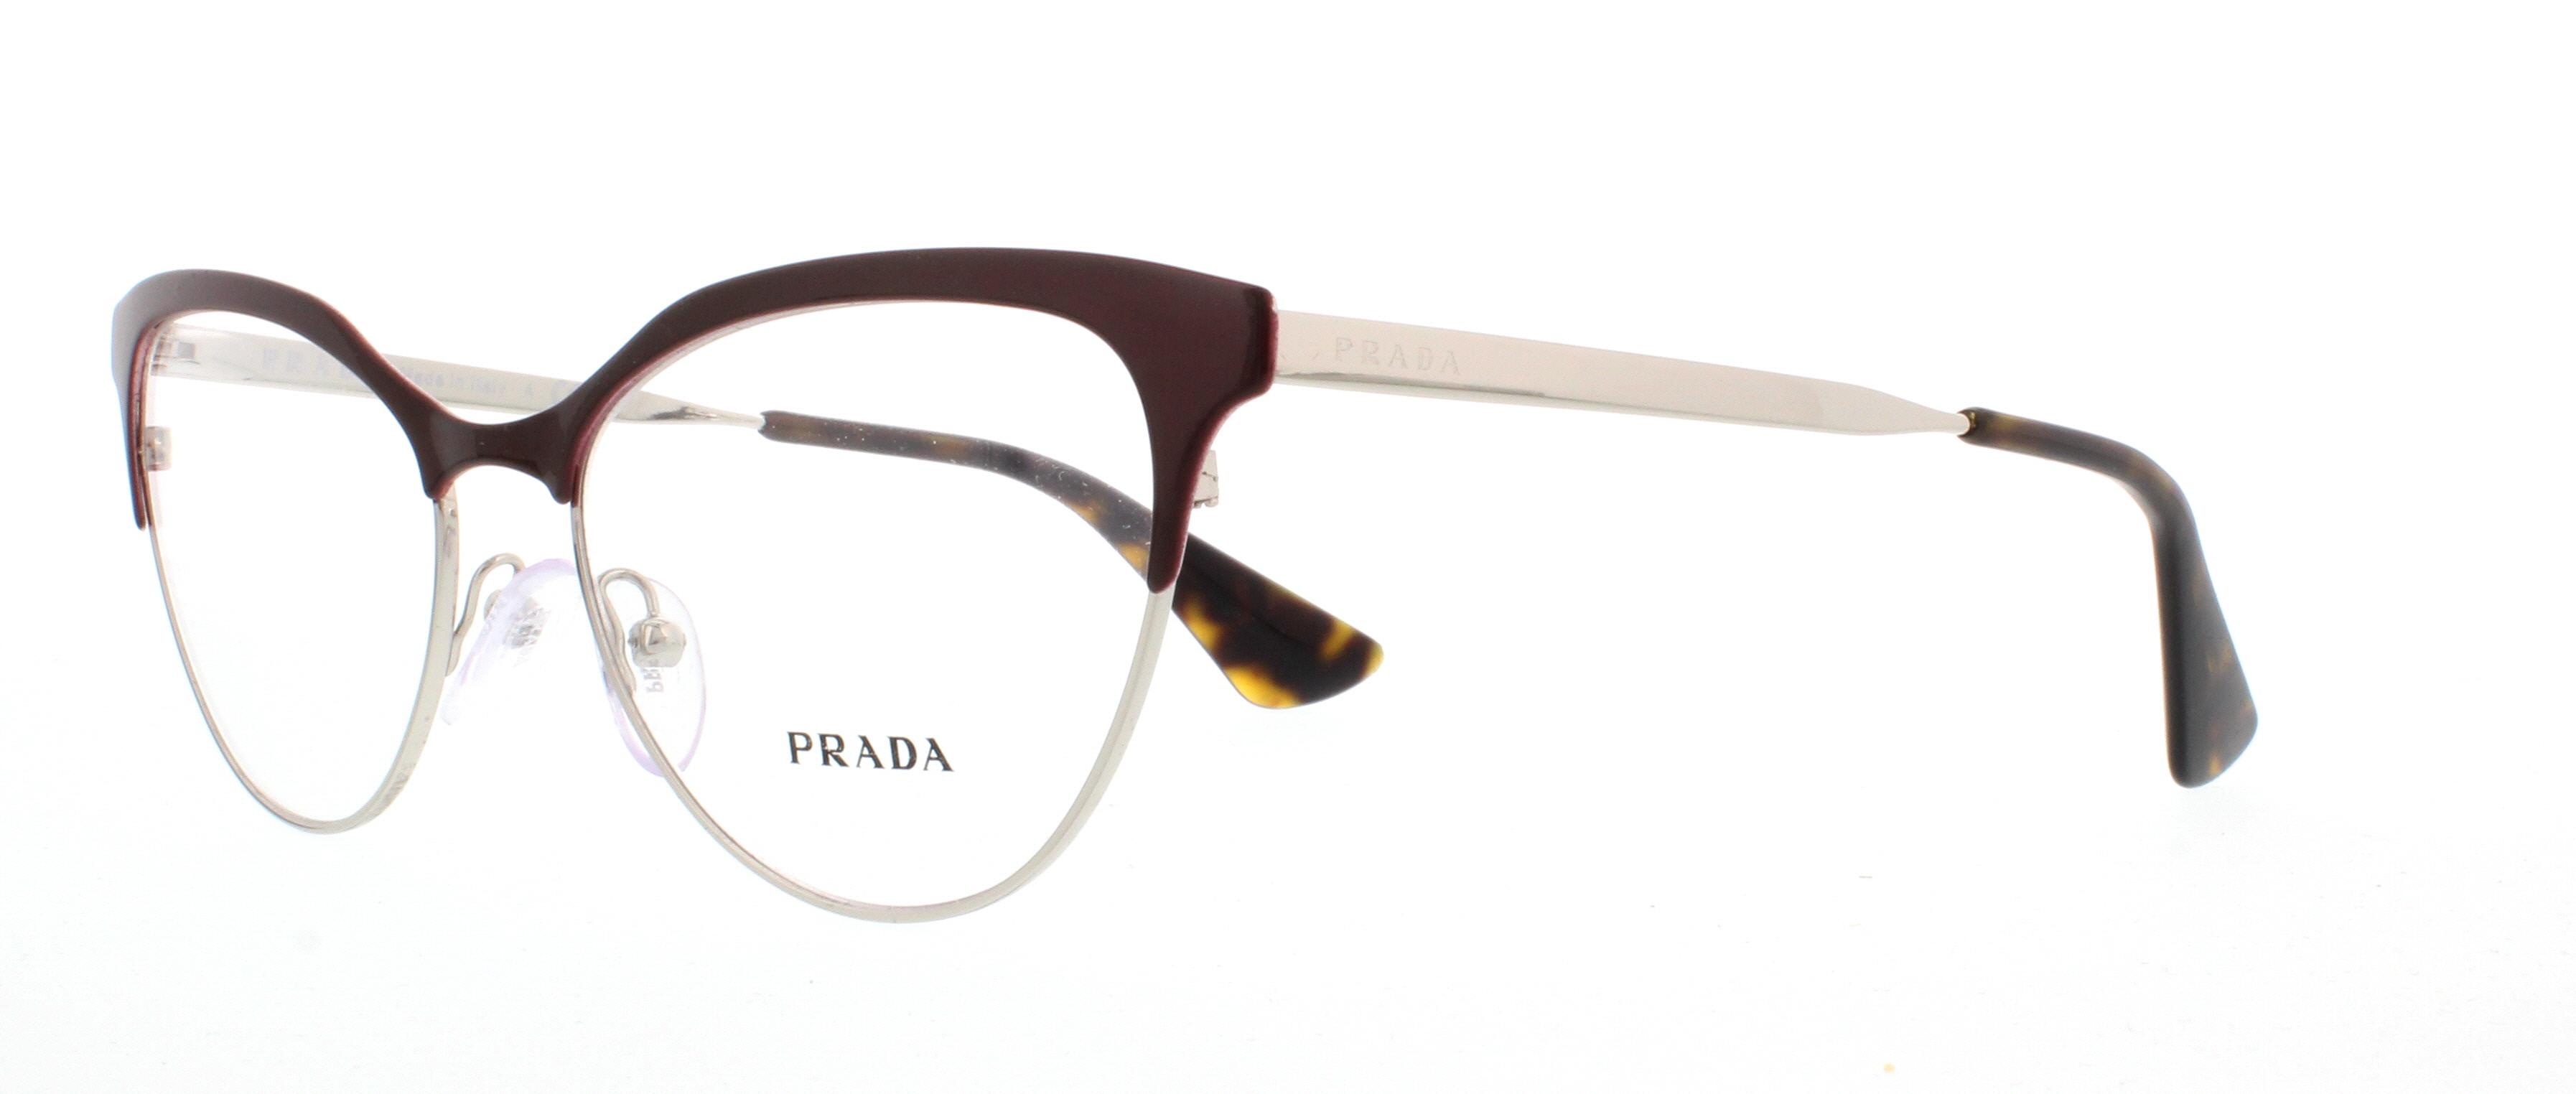 80f85da62707 Designer Frames Outlet. Prada PR55SV Cinema